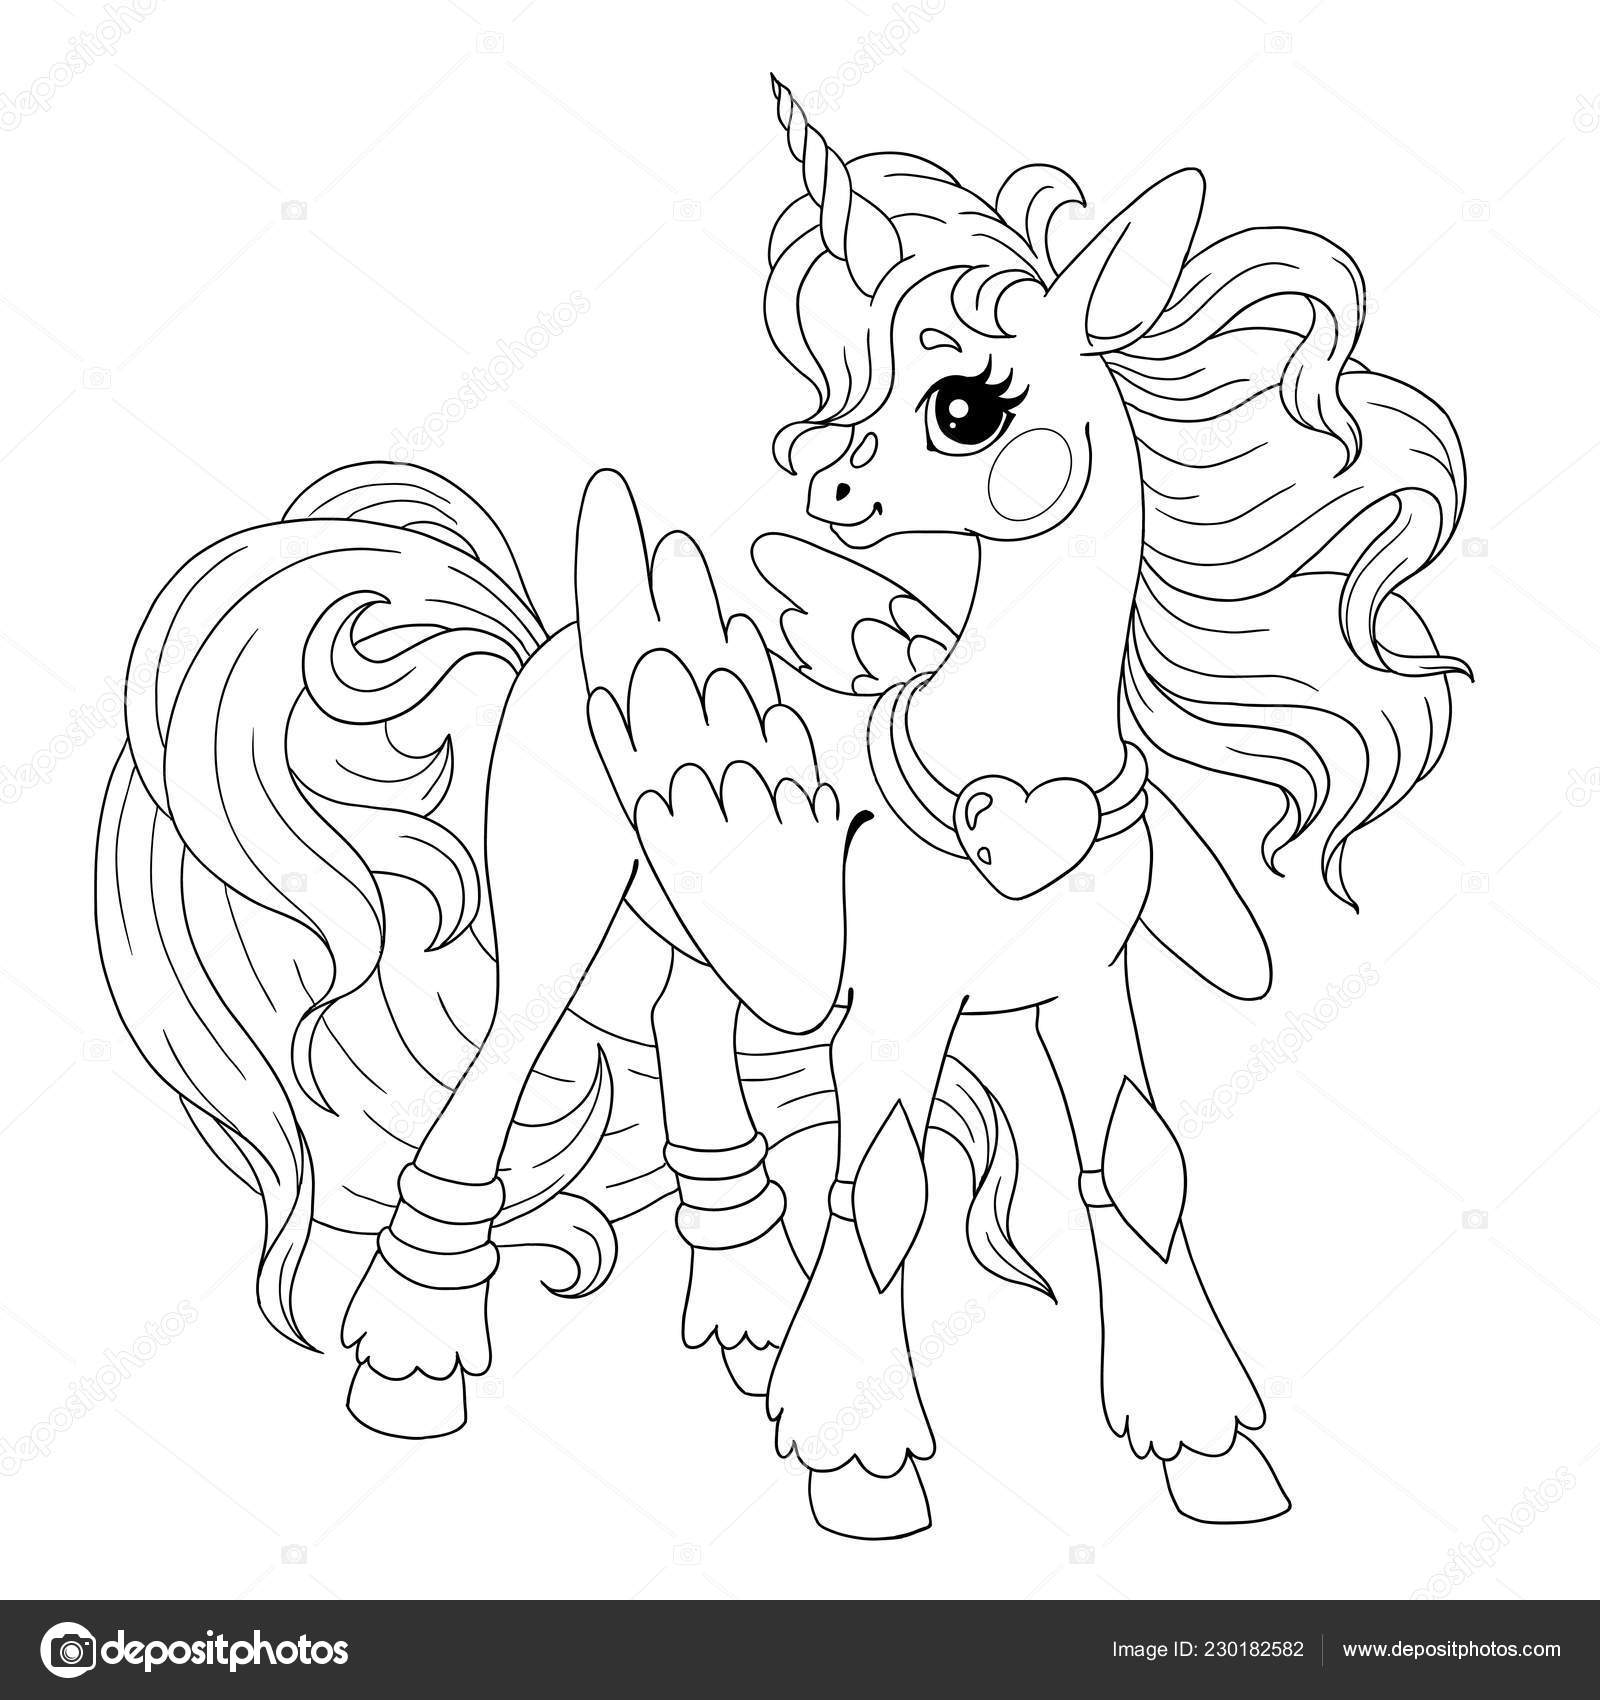 Personaje Dibujos Animados Para Colorear Libro Doodle Pony Unicornio